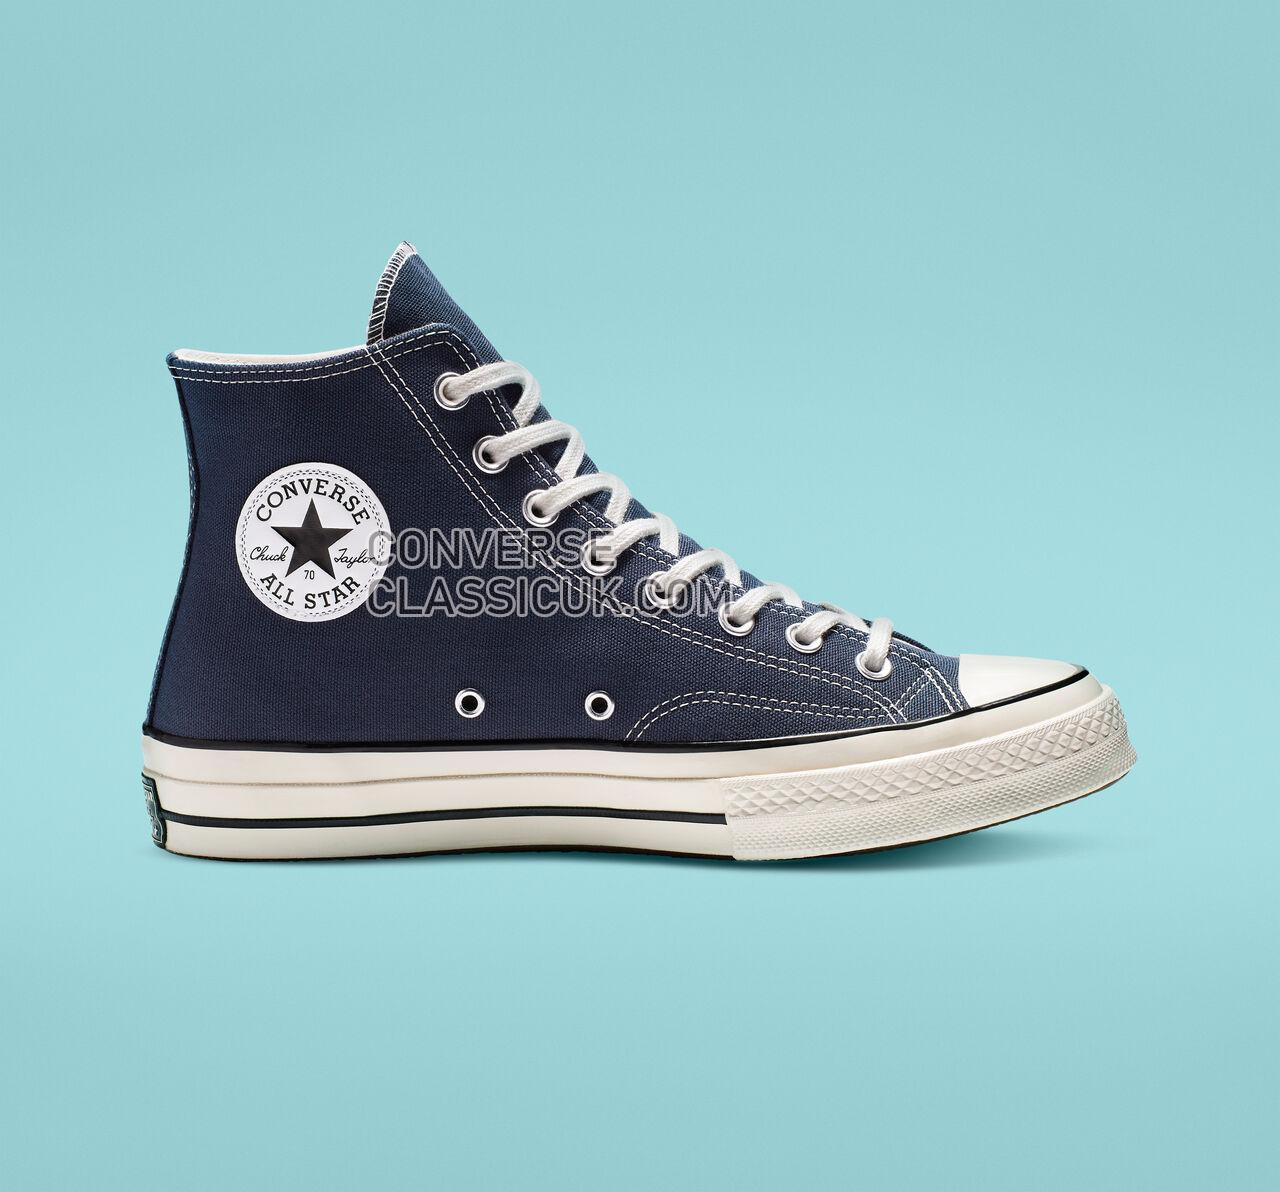 Converse Chuck 70 High Top Mens Womens Unisex 164945C Obsidian/Egret/Black Shoes